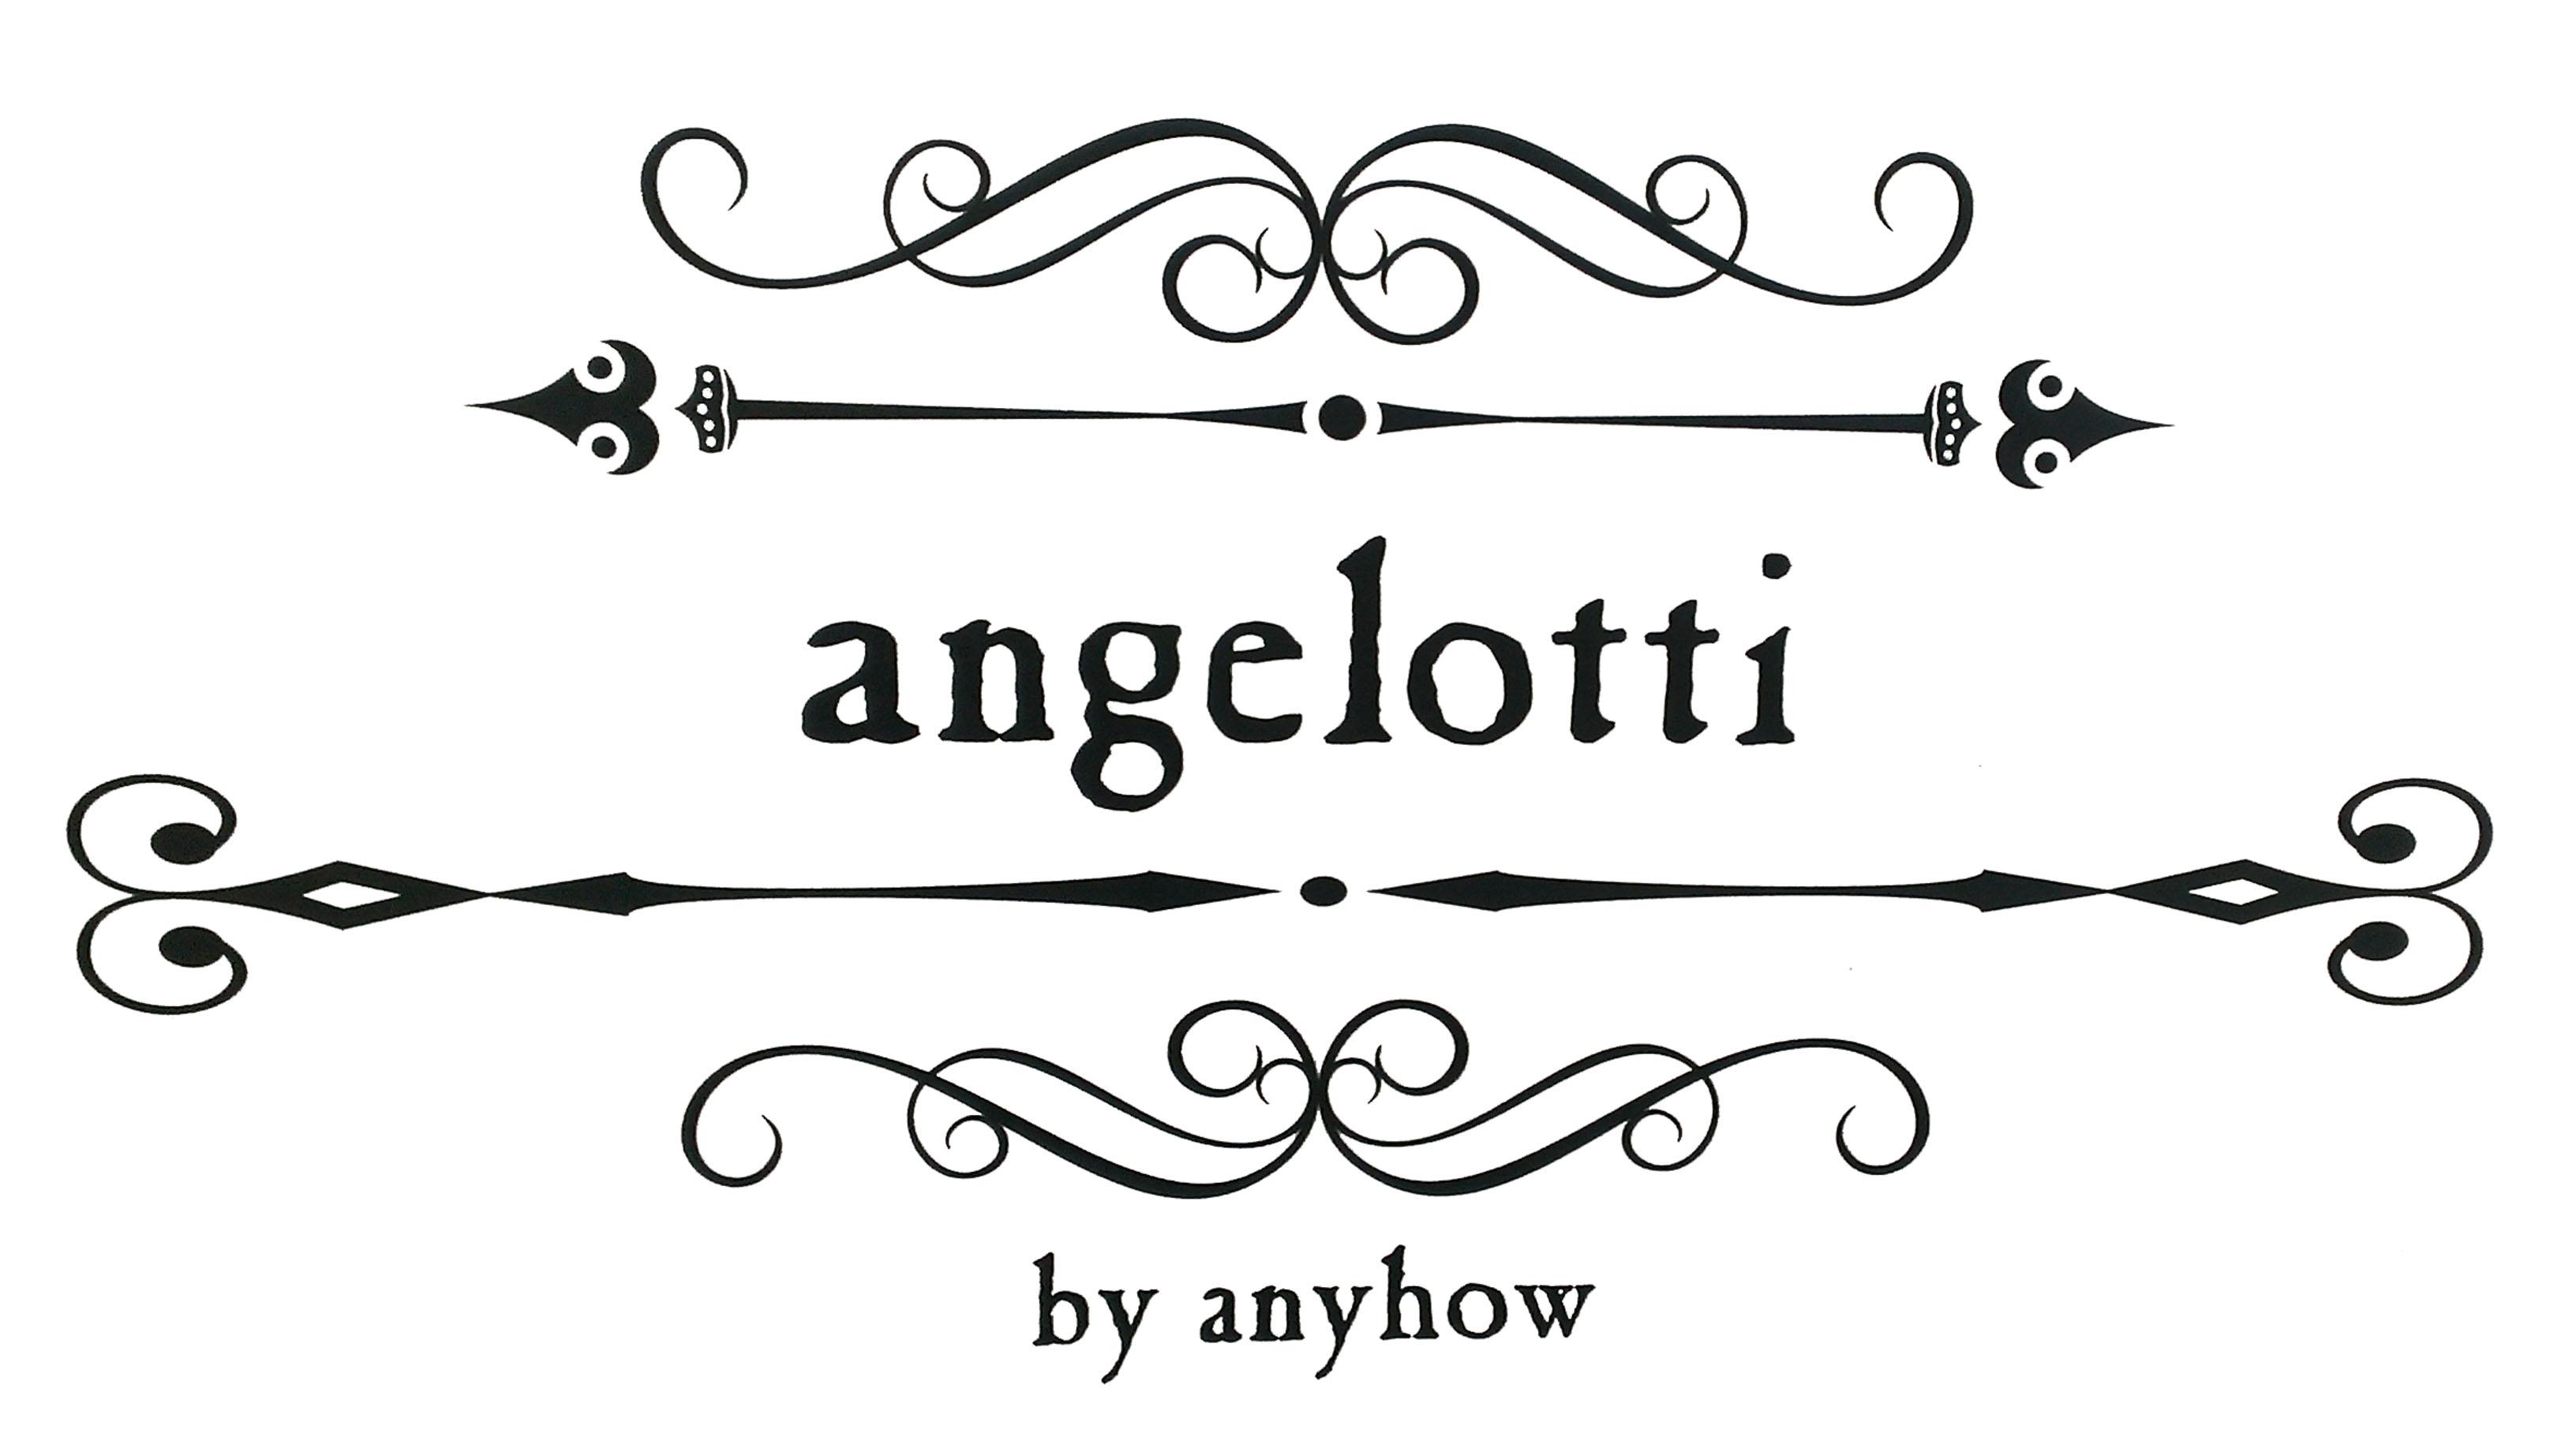 川口 美容室 美容院 angelotti by anyhow